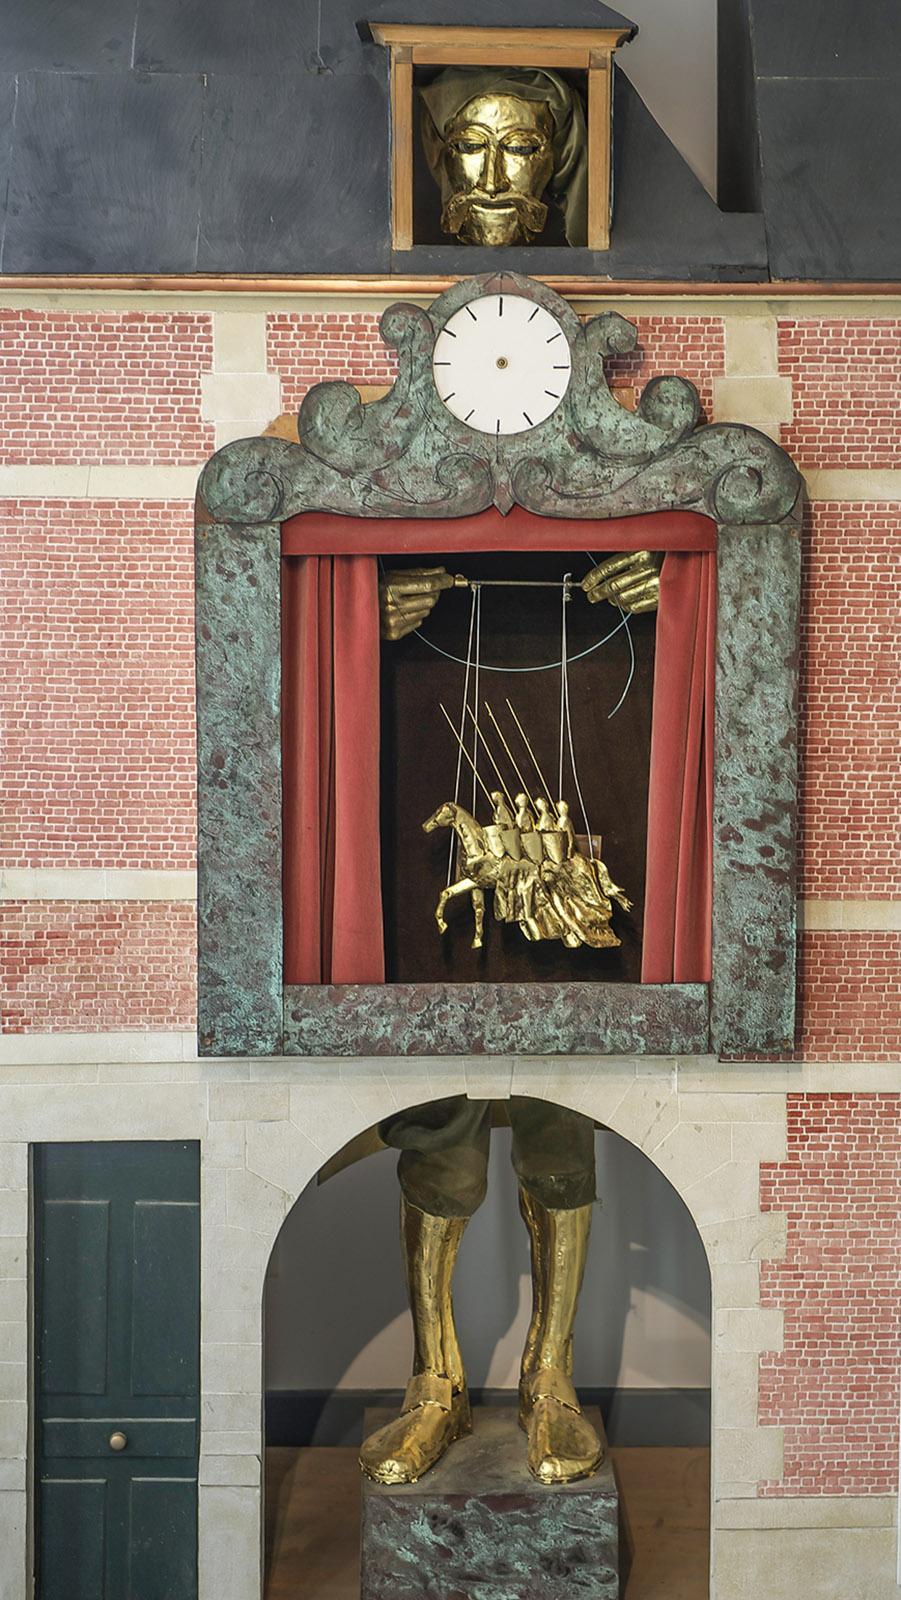 Die große Marionette in Gänze. Foto: Hilke Maunder